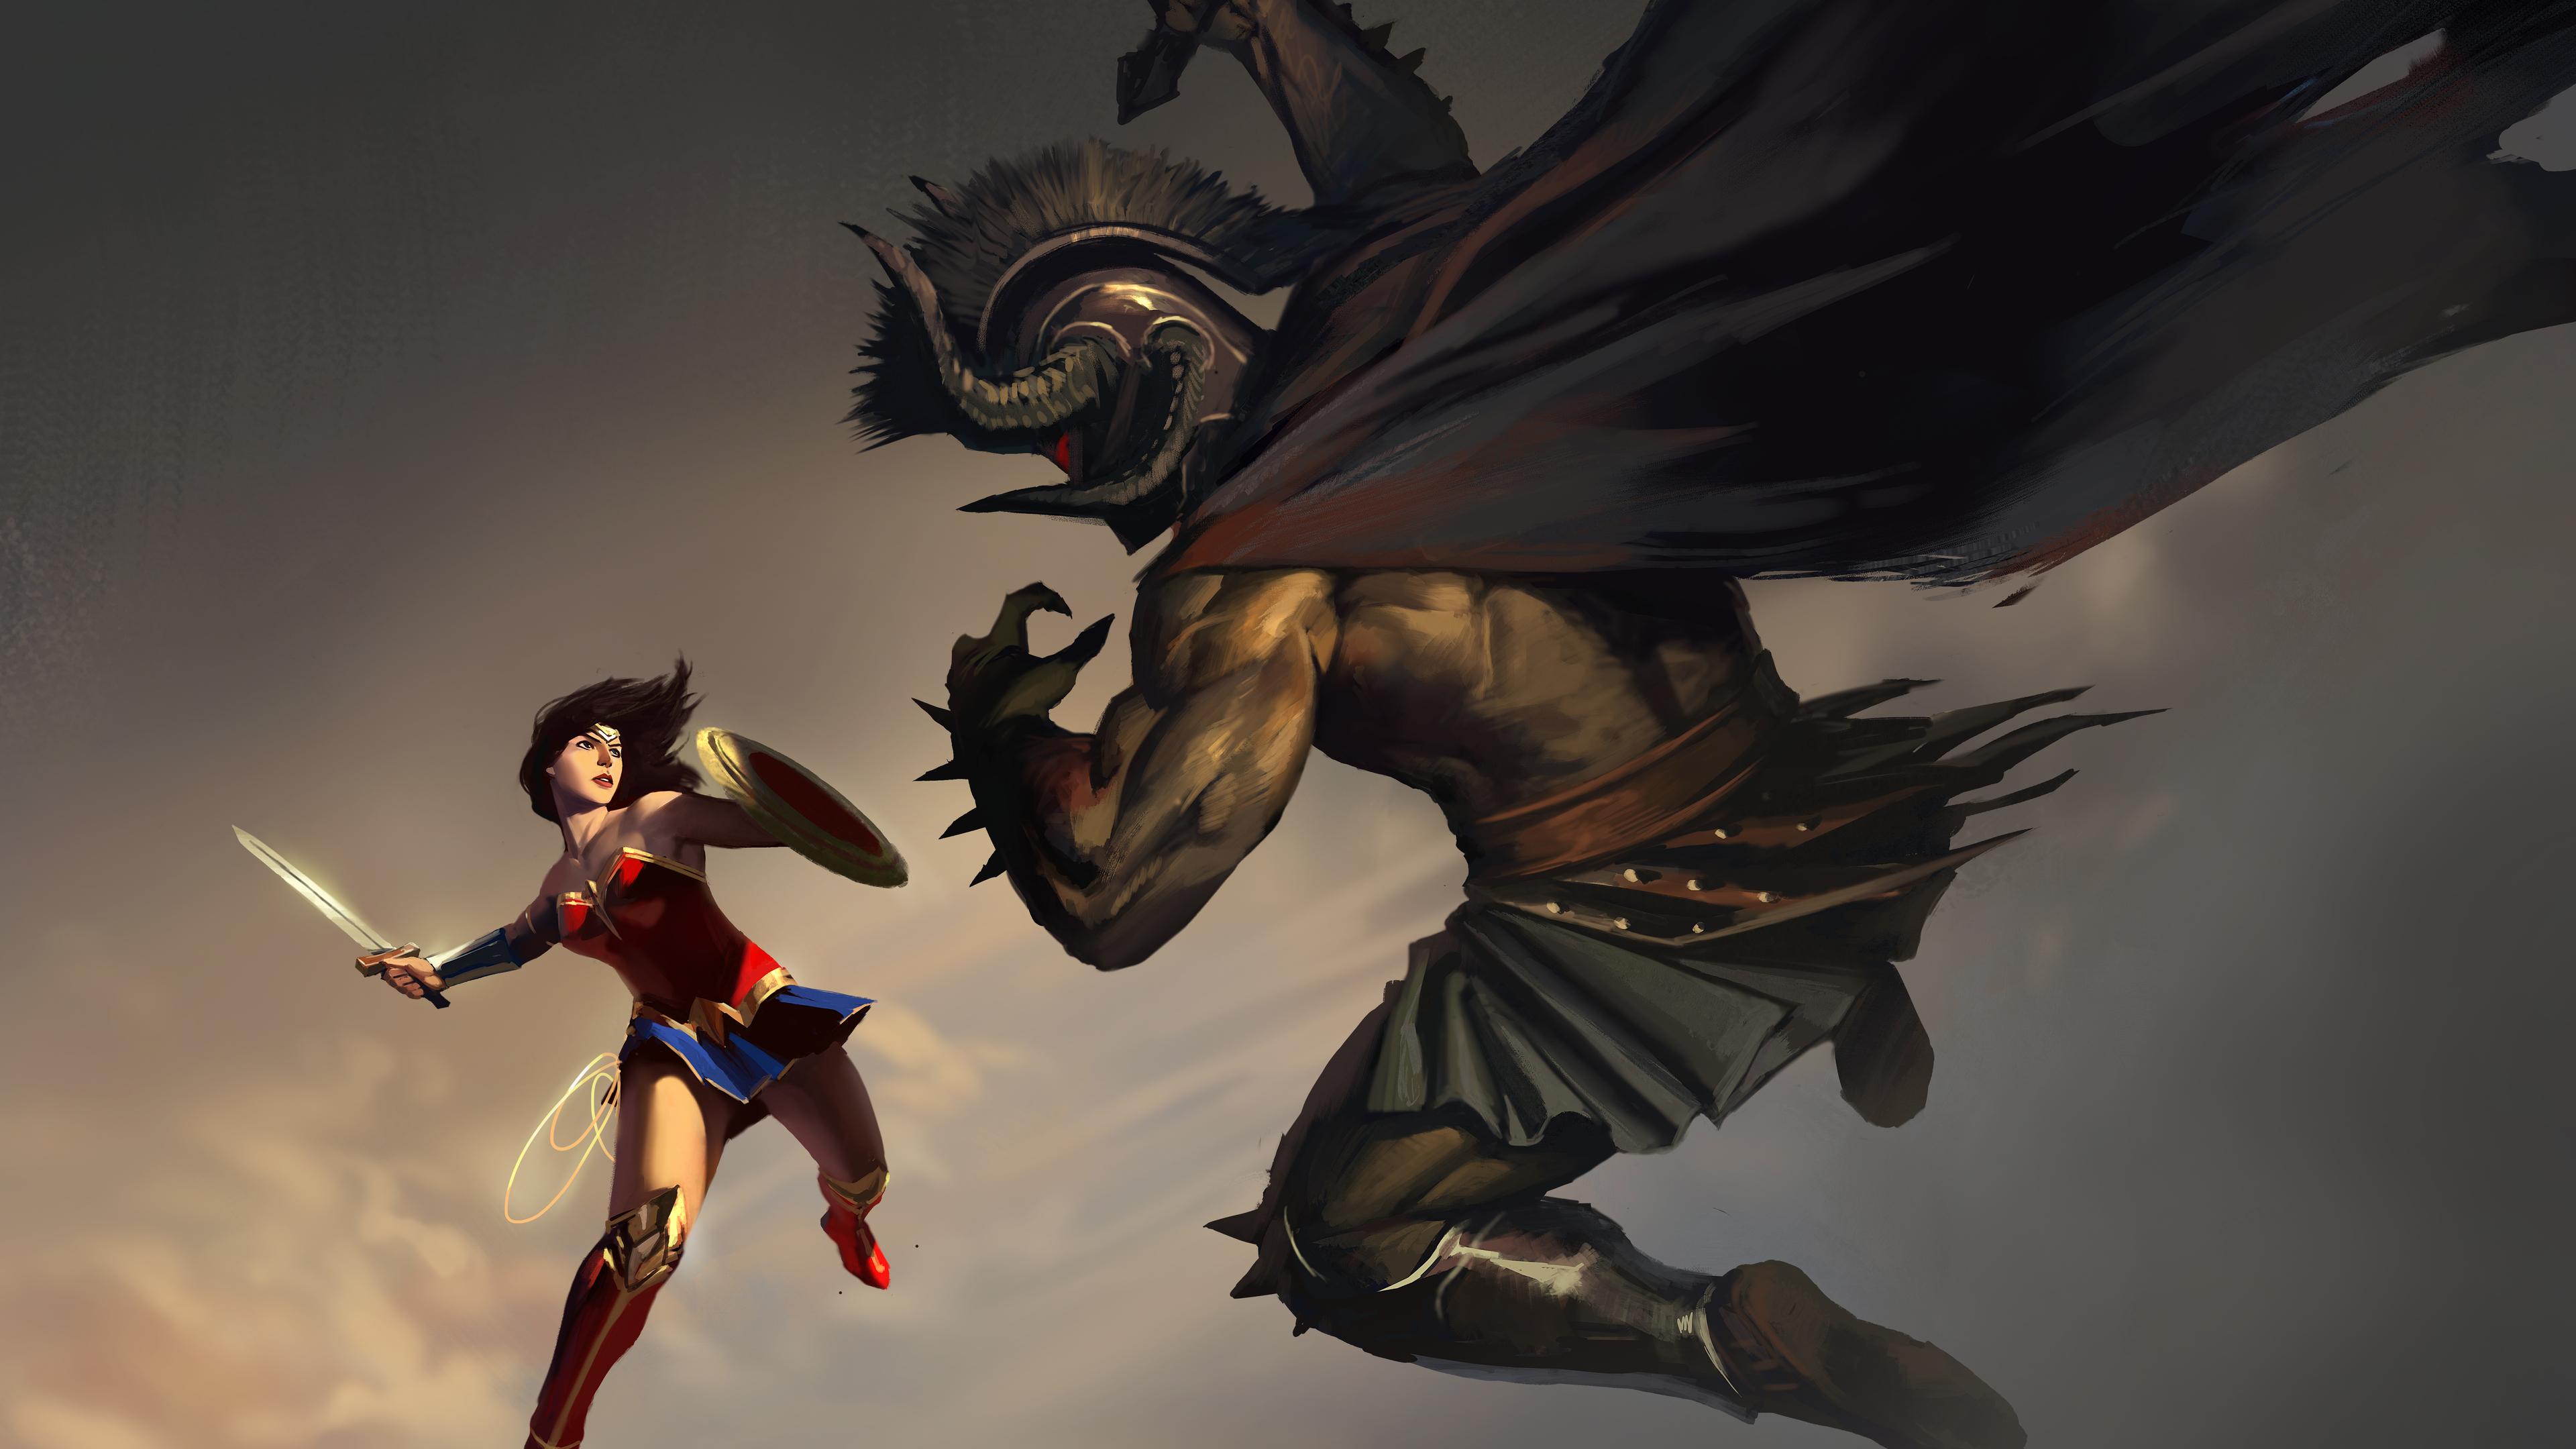 wonder-woman-vs-ares-8k-artwork-b9.jpg